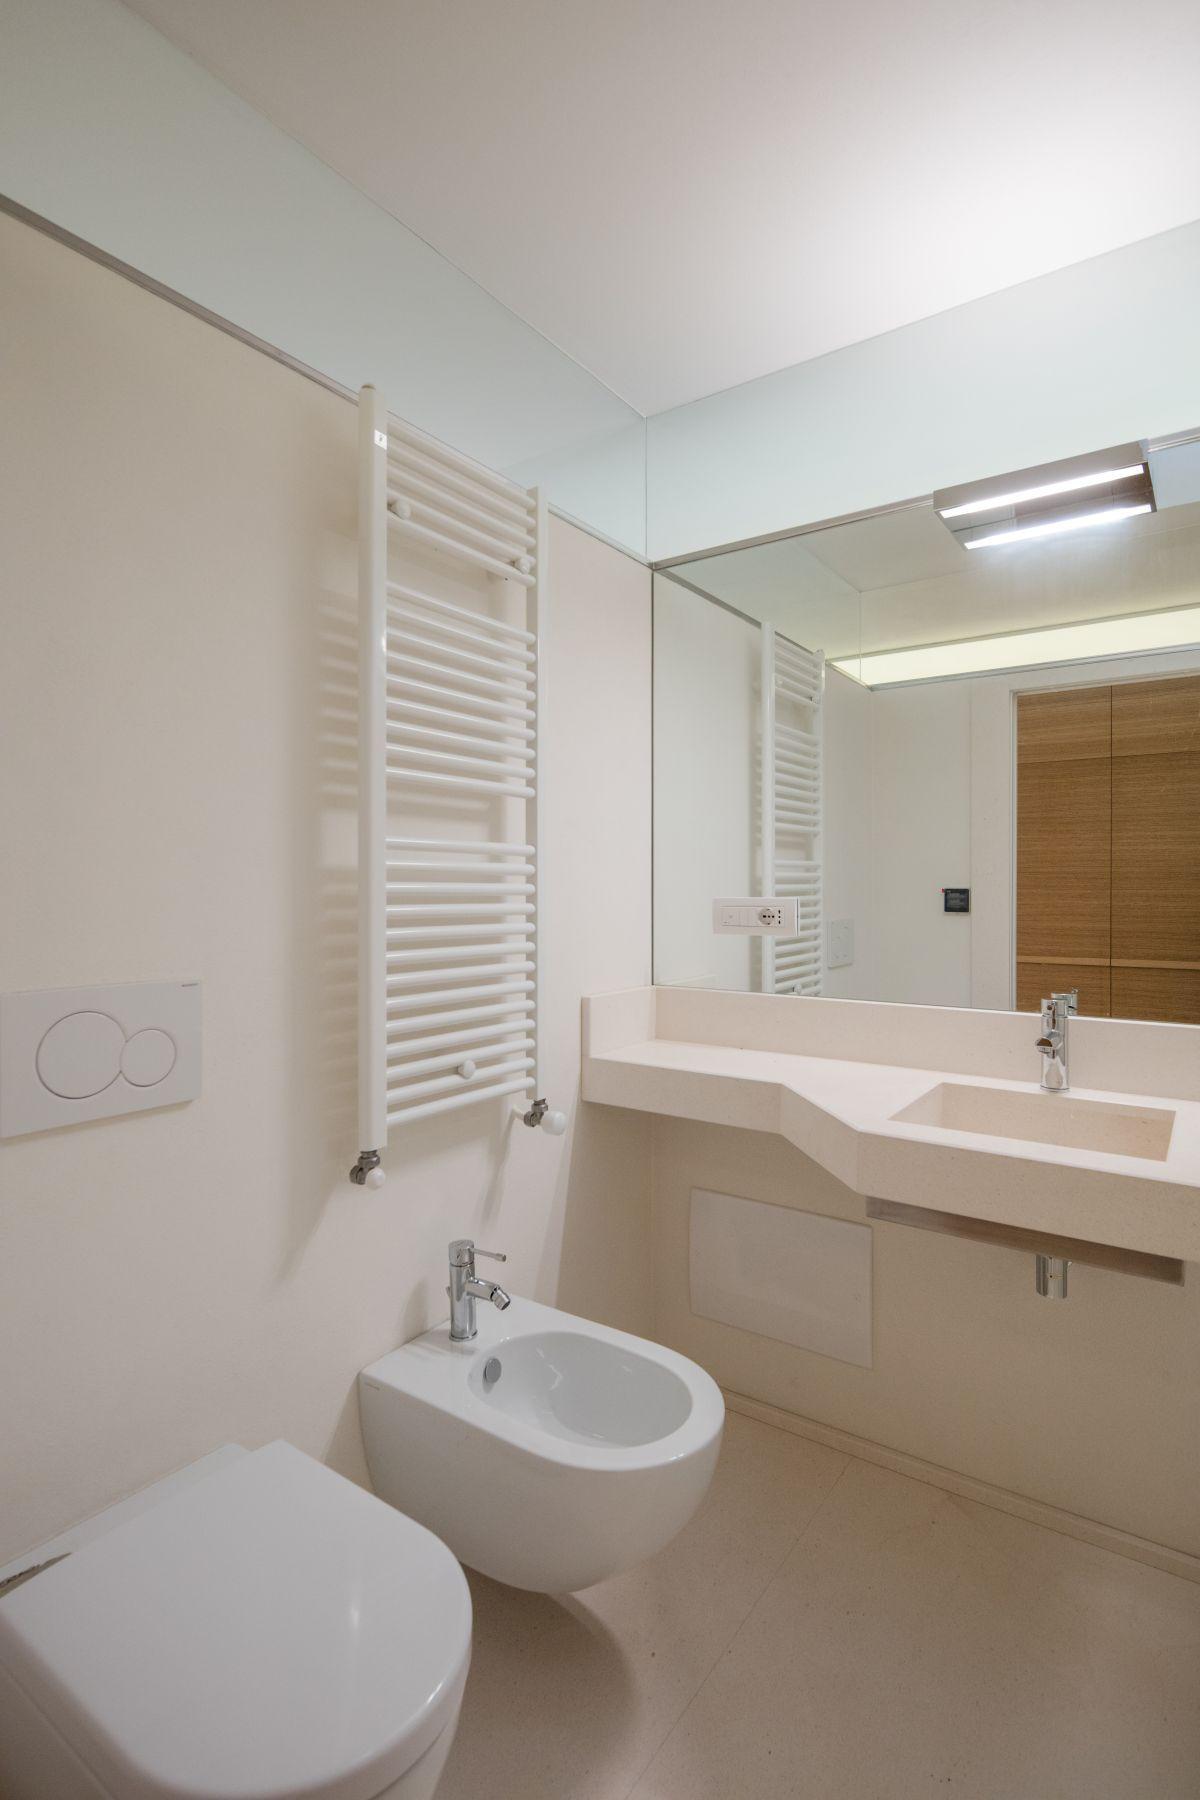 Casa nel Bosco bathroom mirror